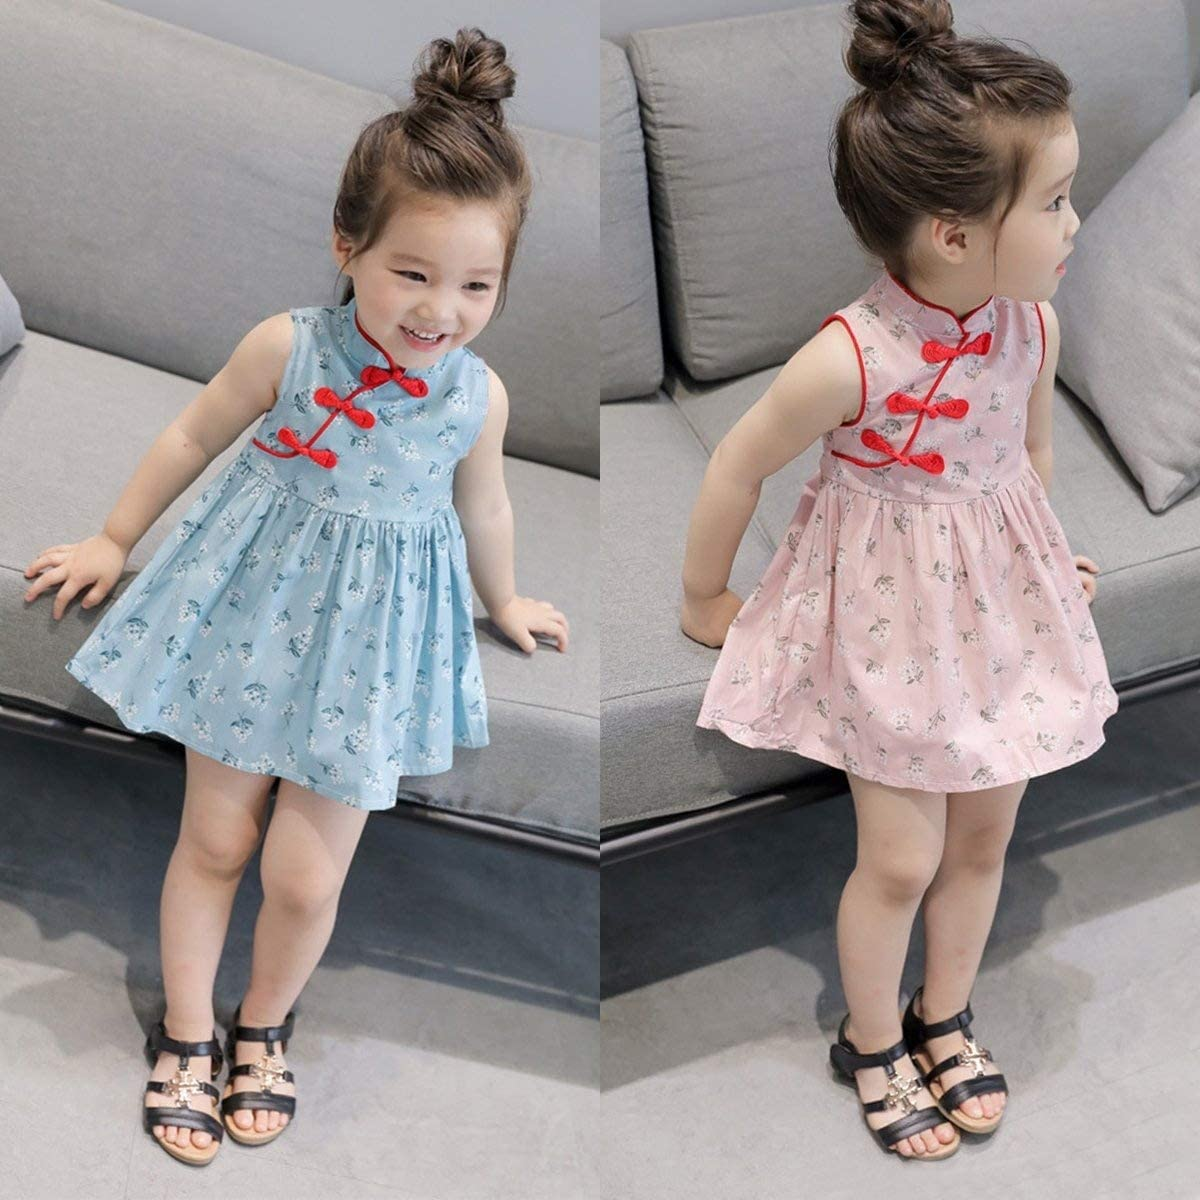 XINSHUN Kid Princess Girls Vintage Cheongsam Dress Sleeveless Formal Wedding Dresses (Pink,3Y-4Y)